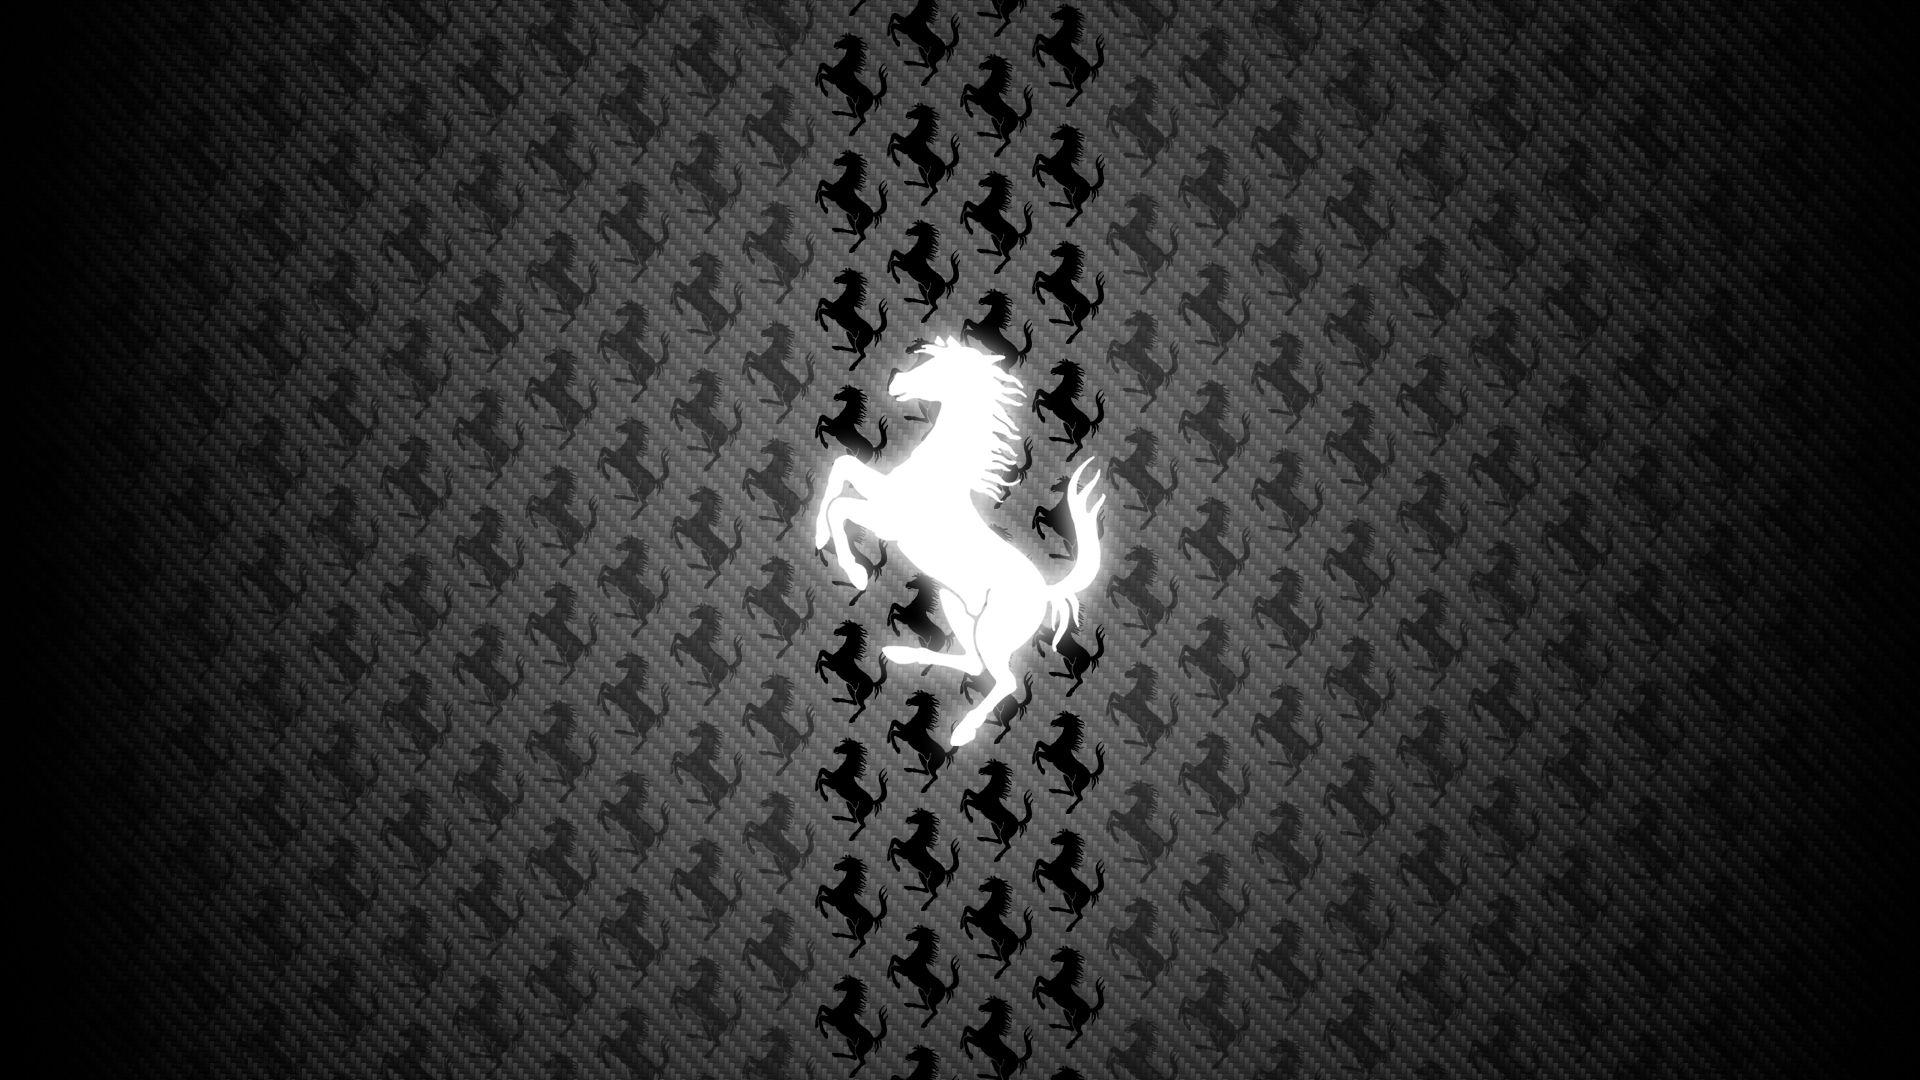 ferrari wallpapers and backgrounds 19201080 imagenes de ferrari wallpapers 31 wallpapers